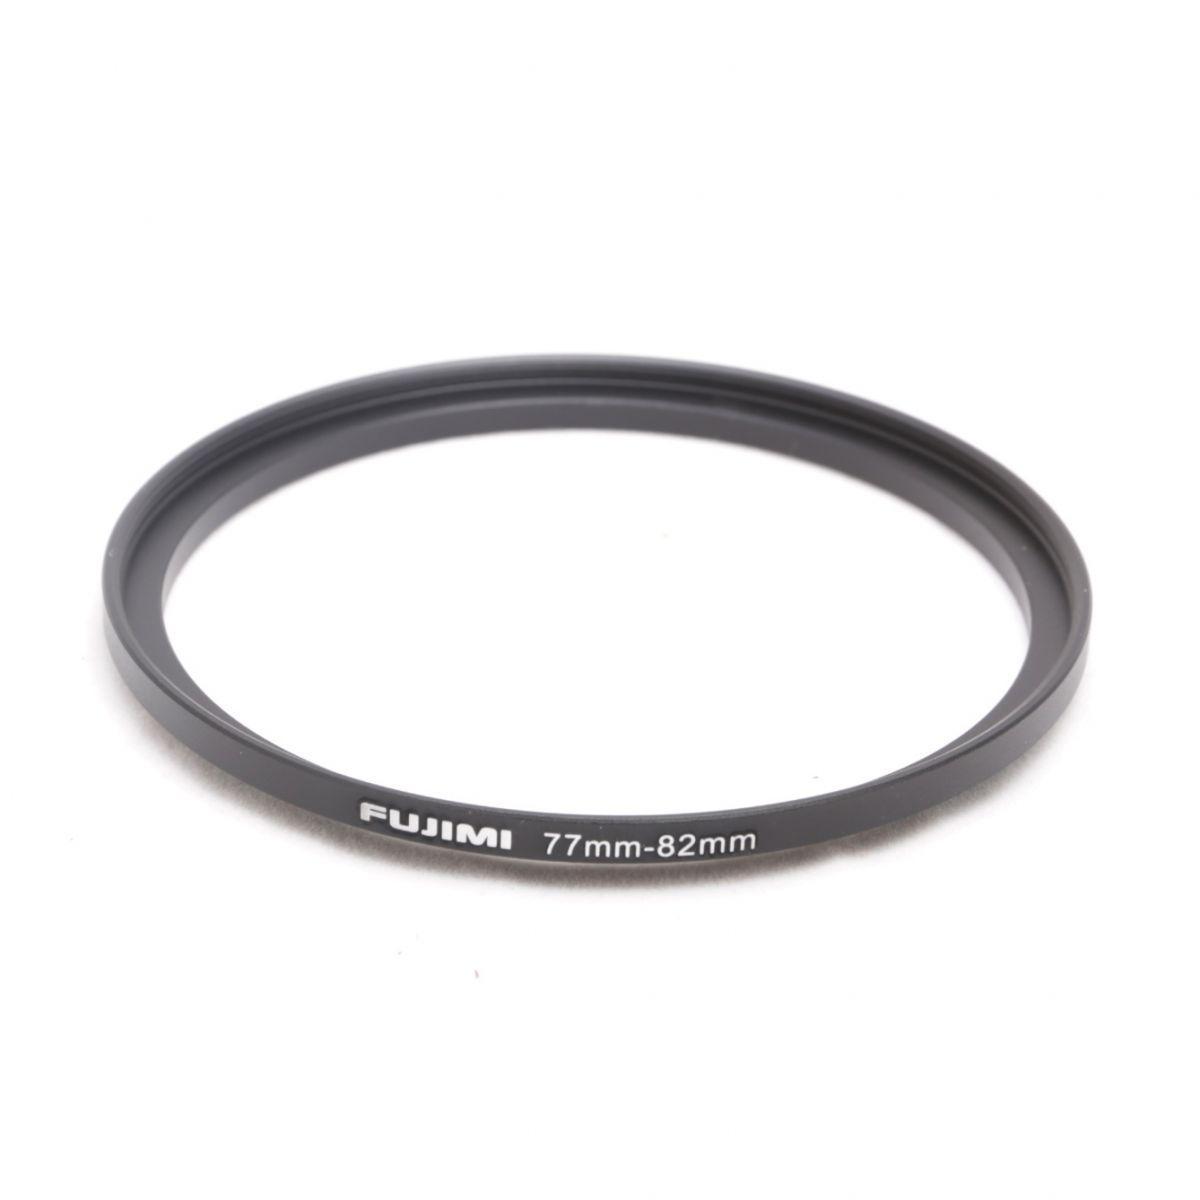 Переходное кольцо Fujimi FRSU-5255 Step-Up Размер 52-55 мм